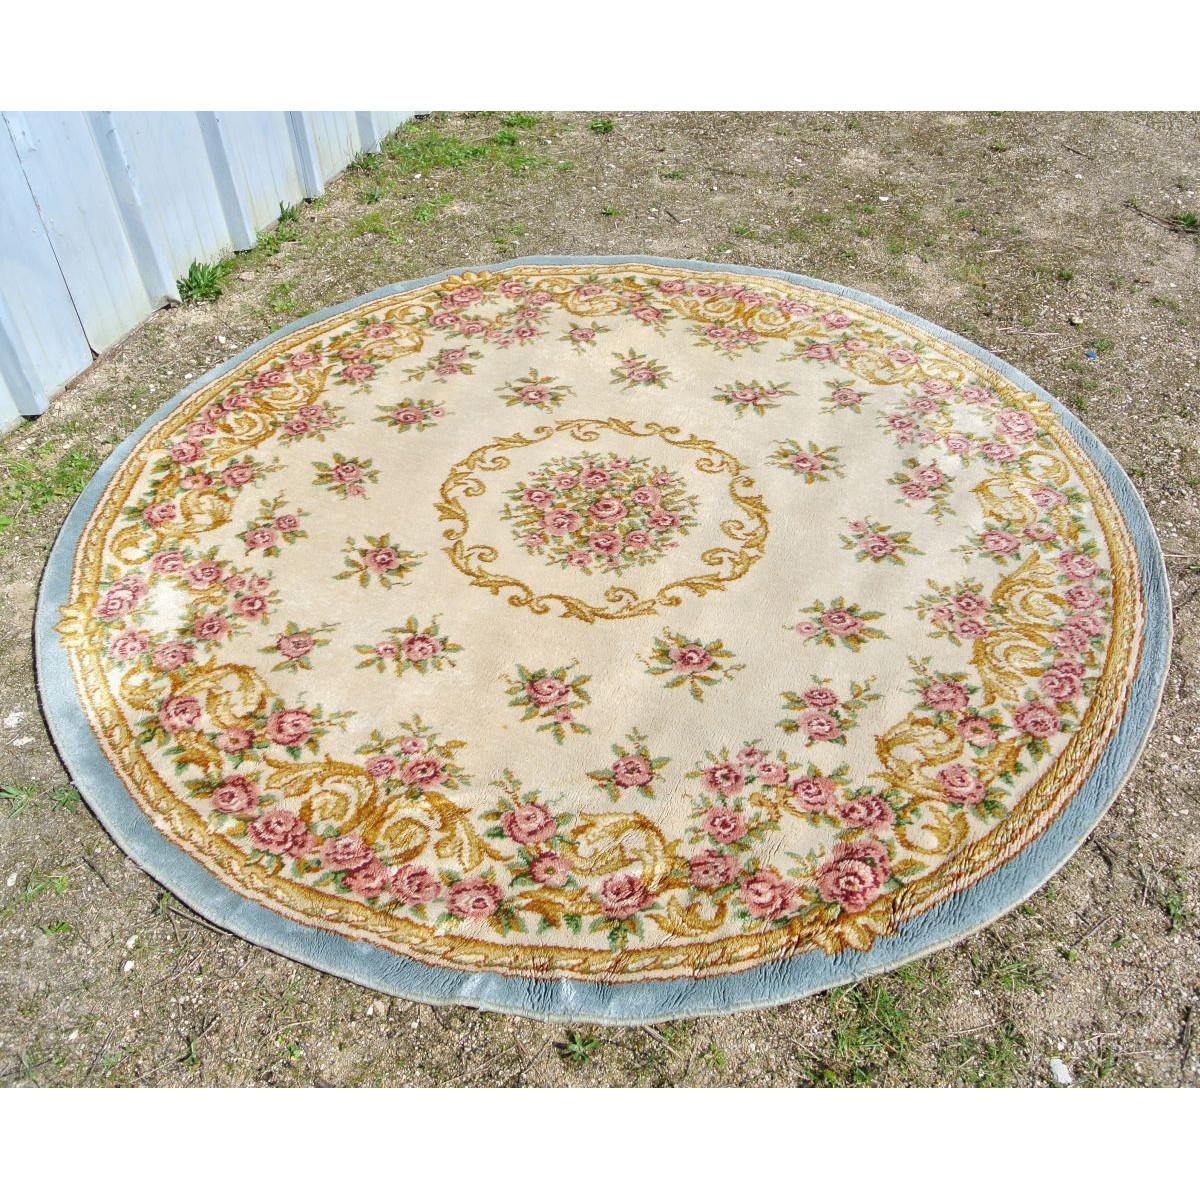 https www lepalaisdesbricoles com fr rideaux coussins tapis 4058 tapis rond ancien fleurs senlis made in holland html